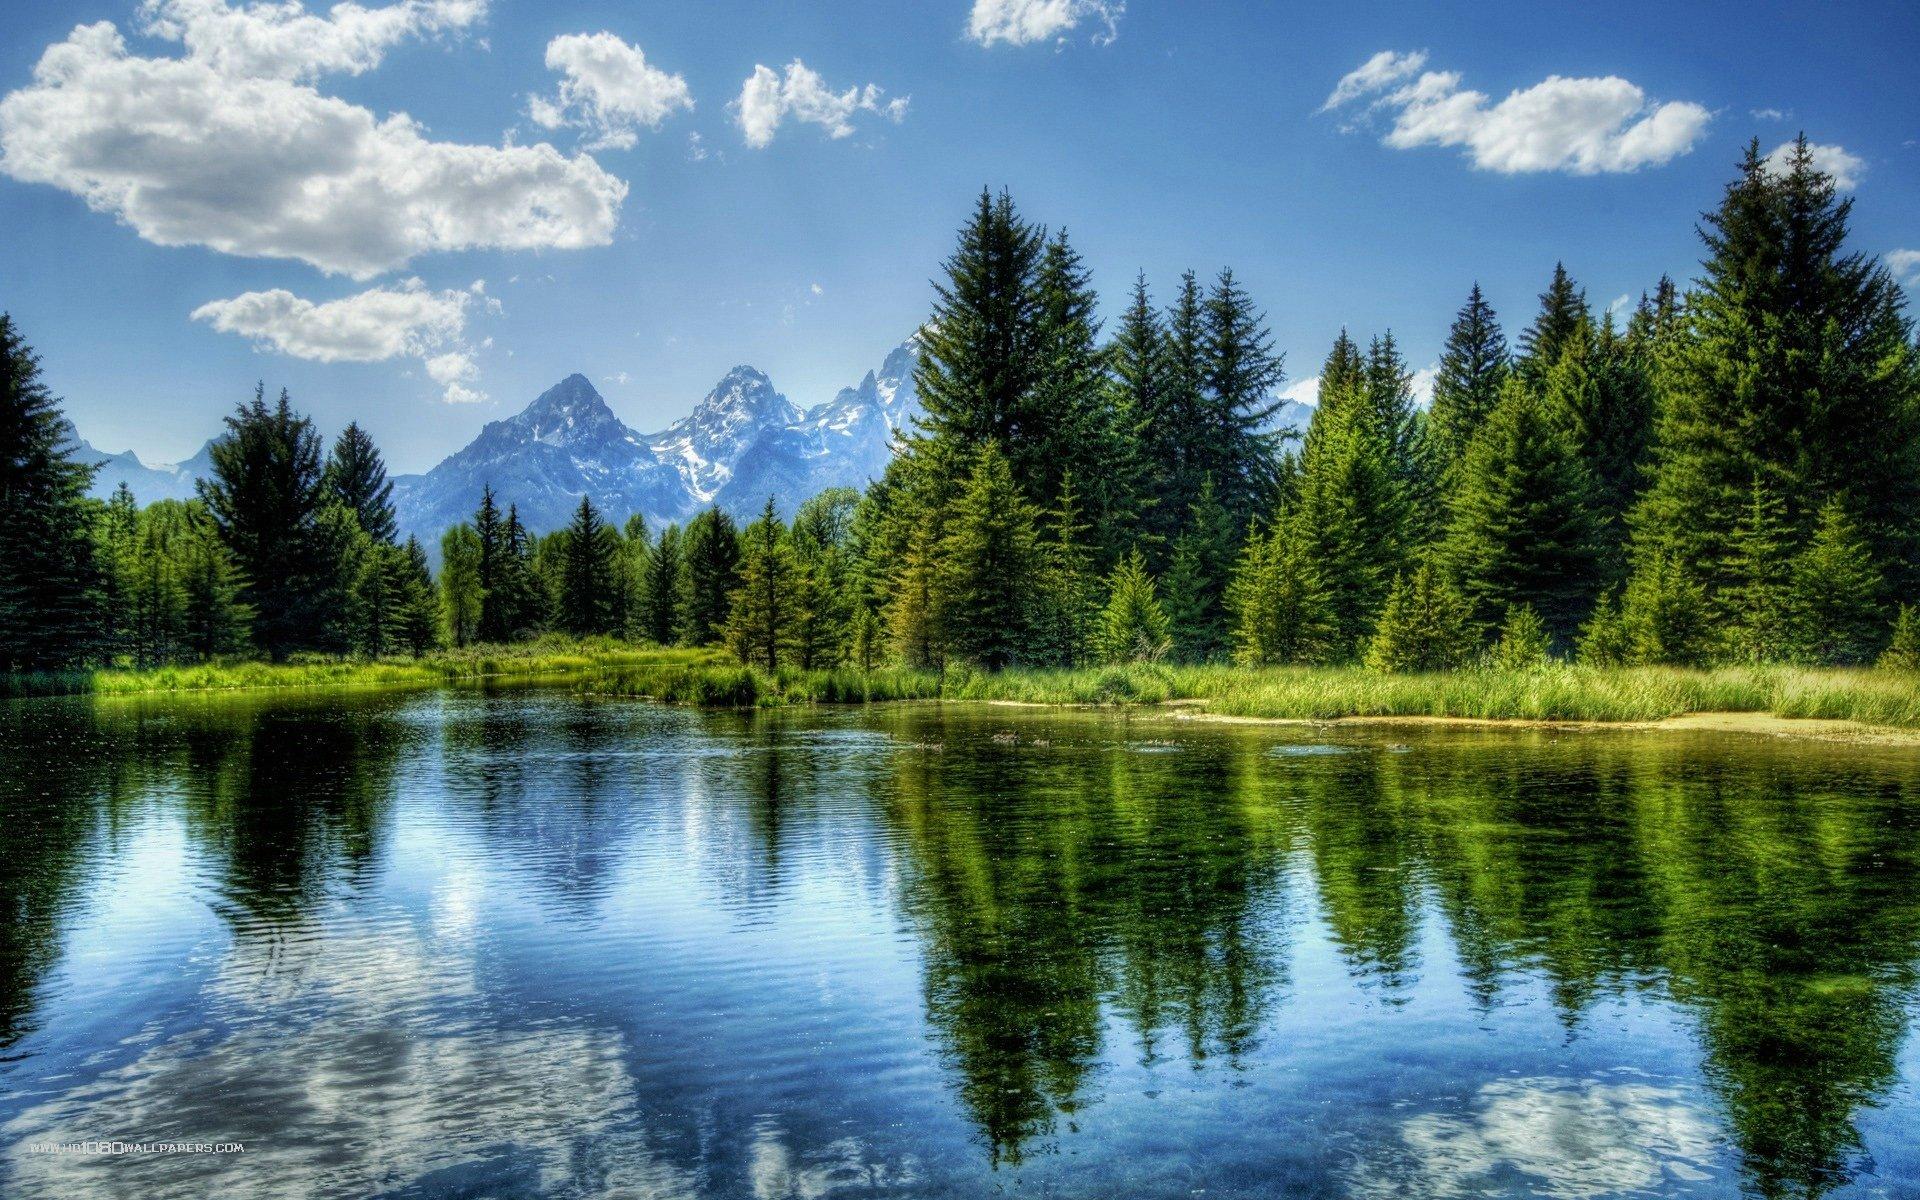 Peaceful Nature 651226 - WallDevil